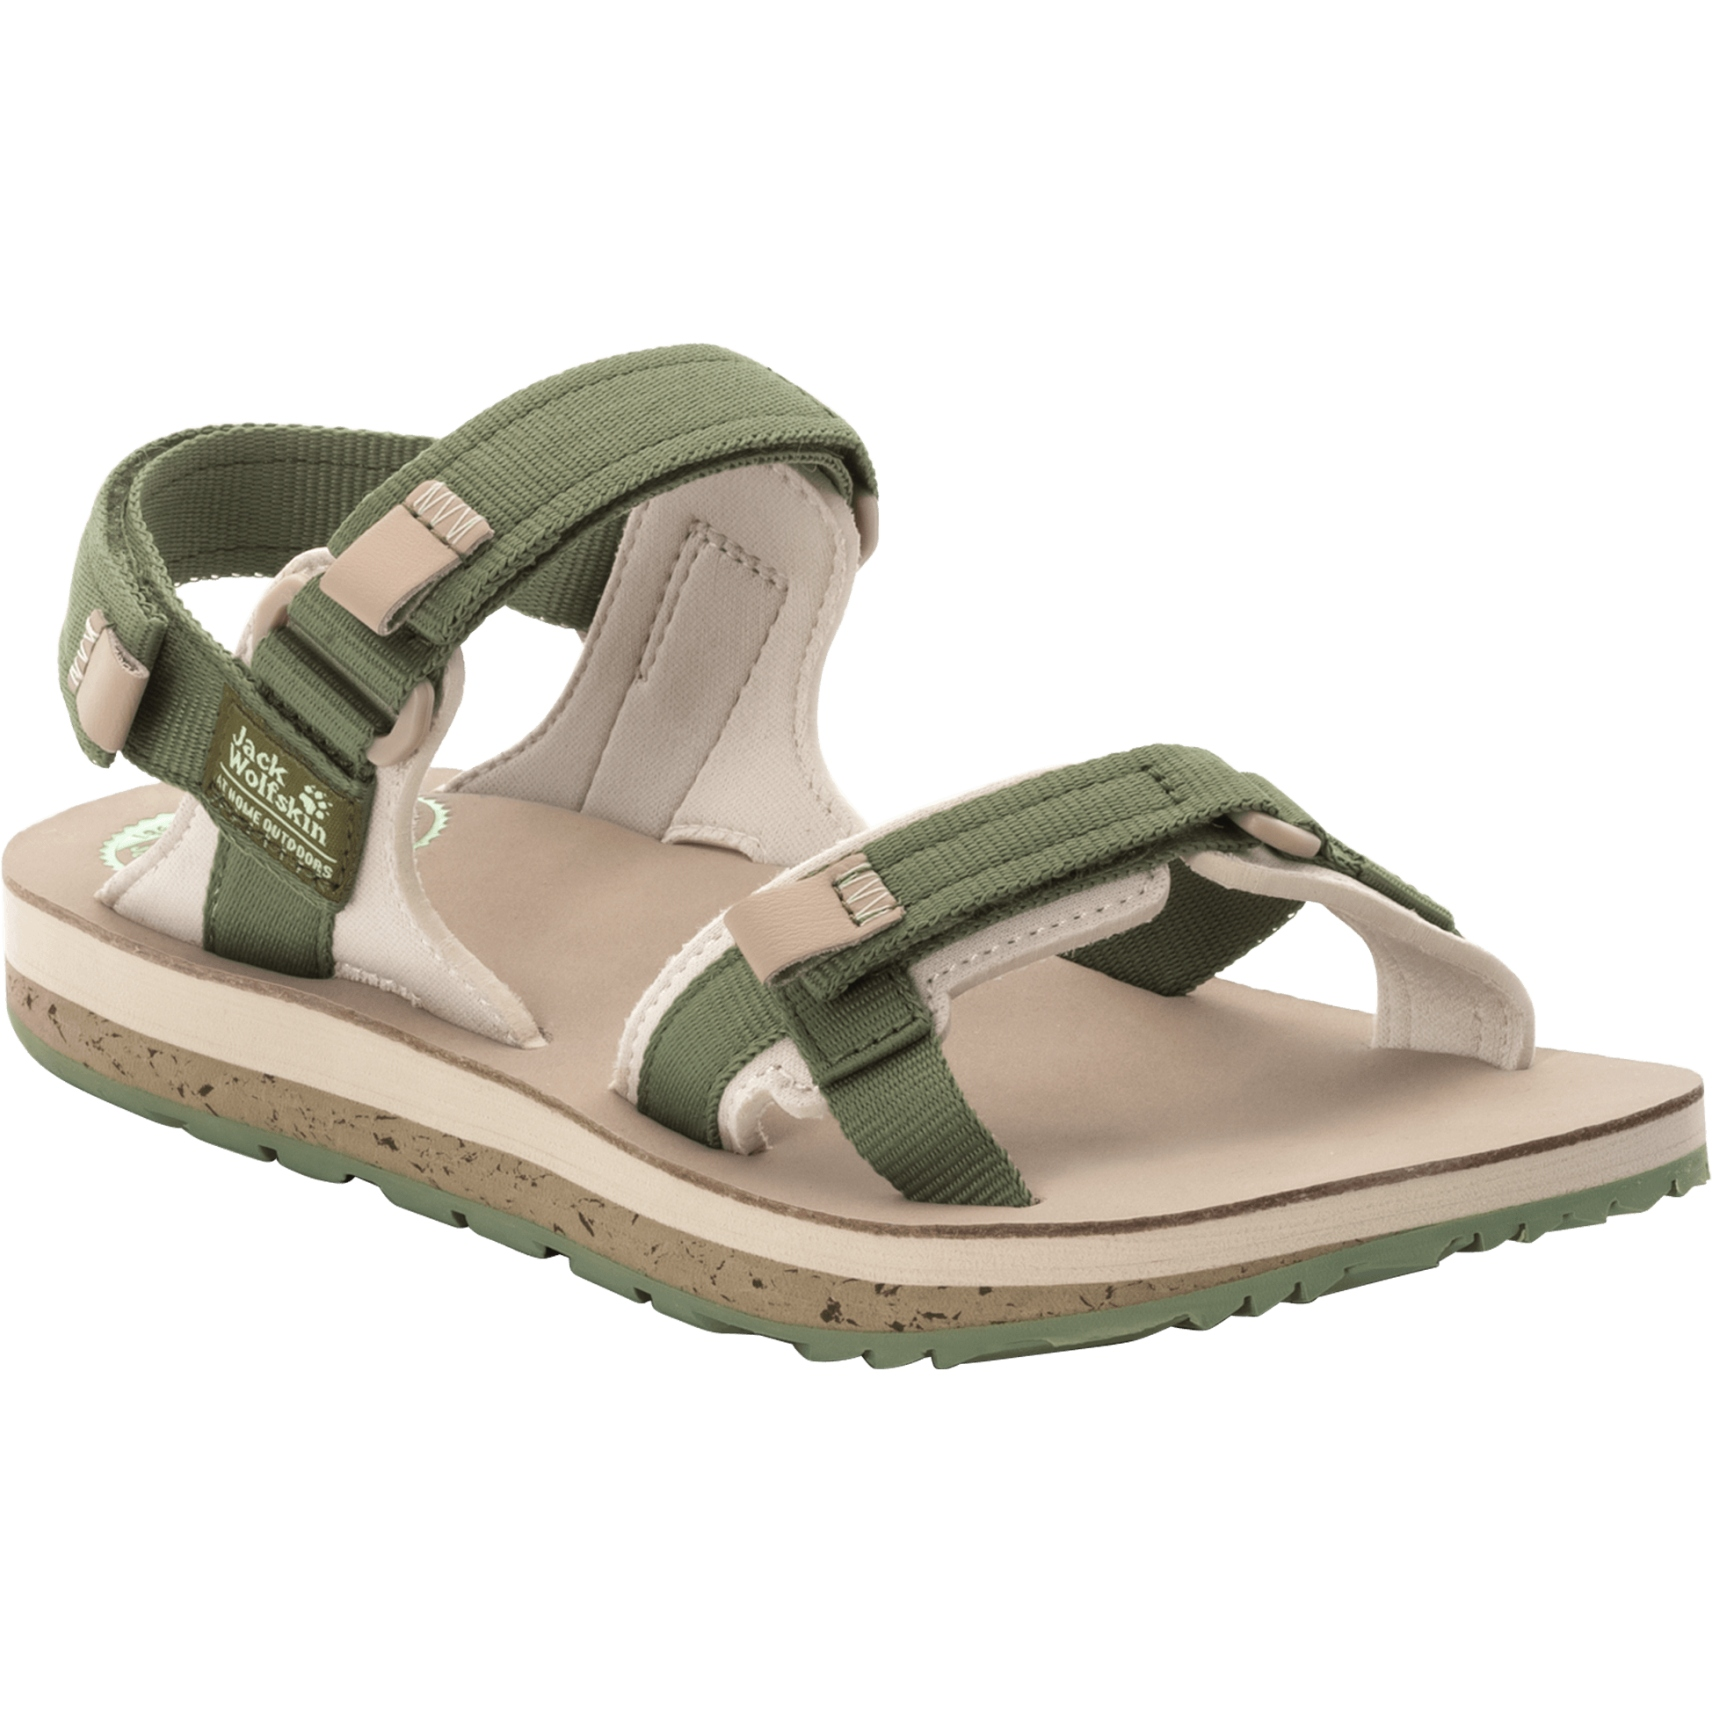 Jack Wolfskin Outfresh Deluxe Damen Sandale - khaki/sand